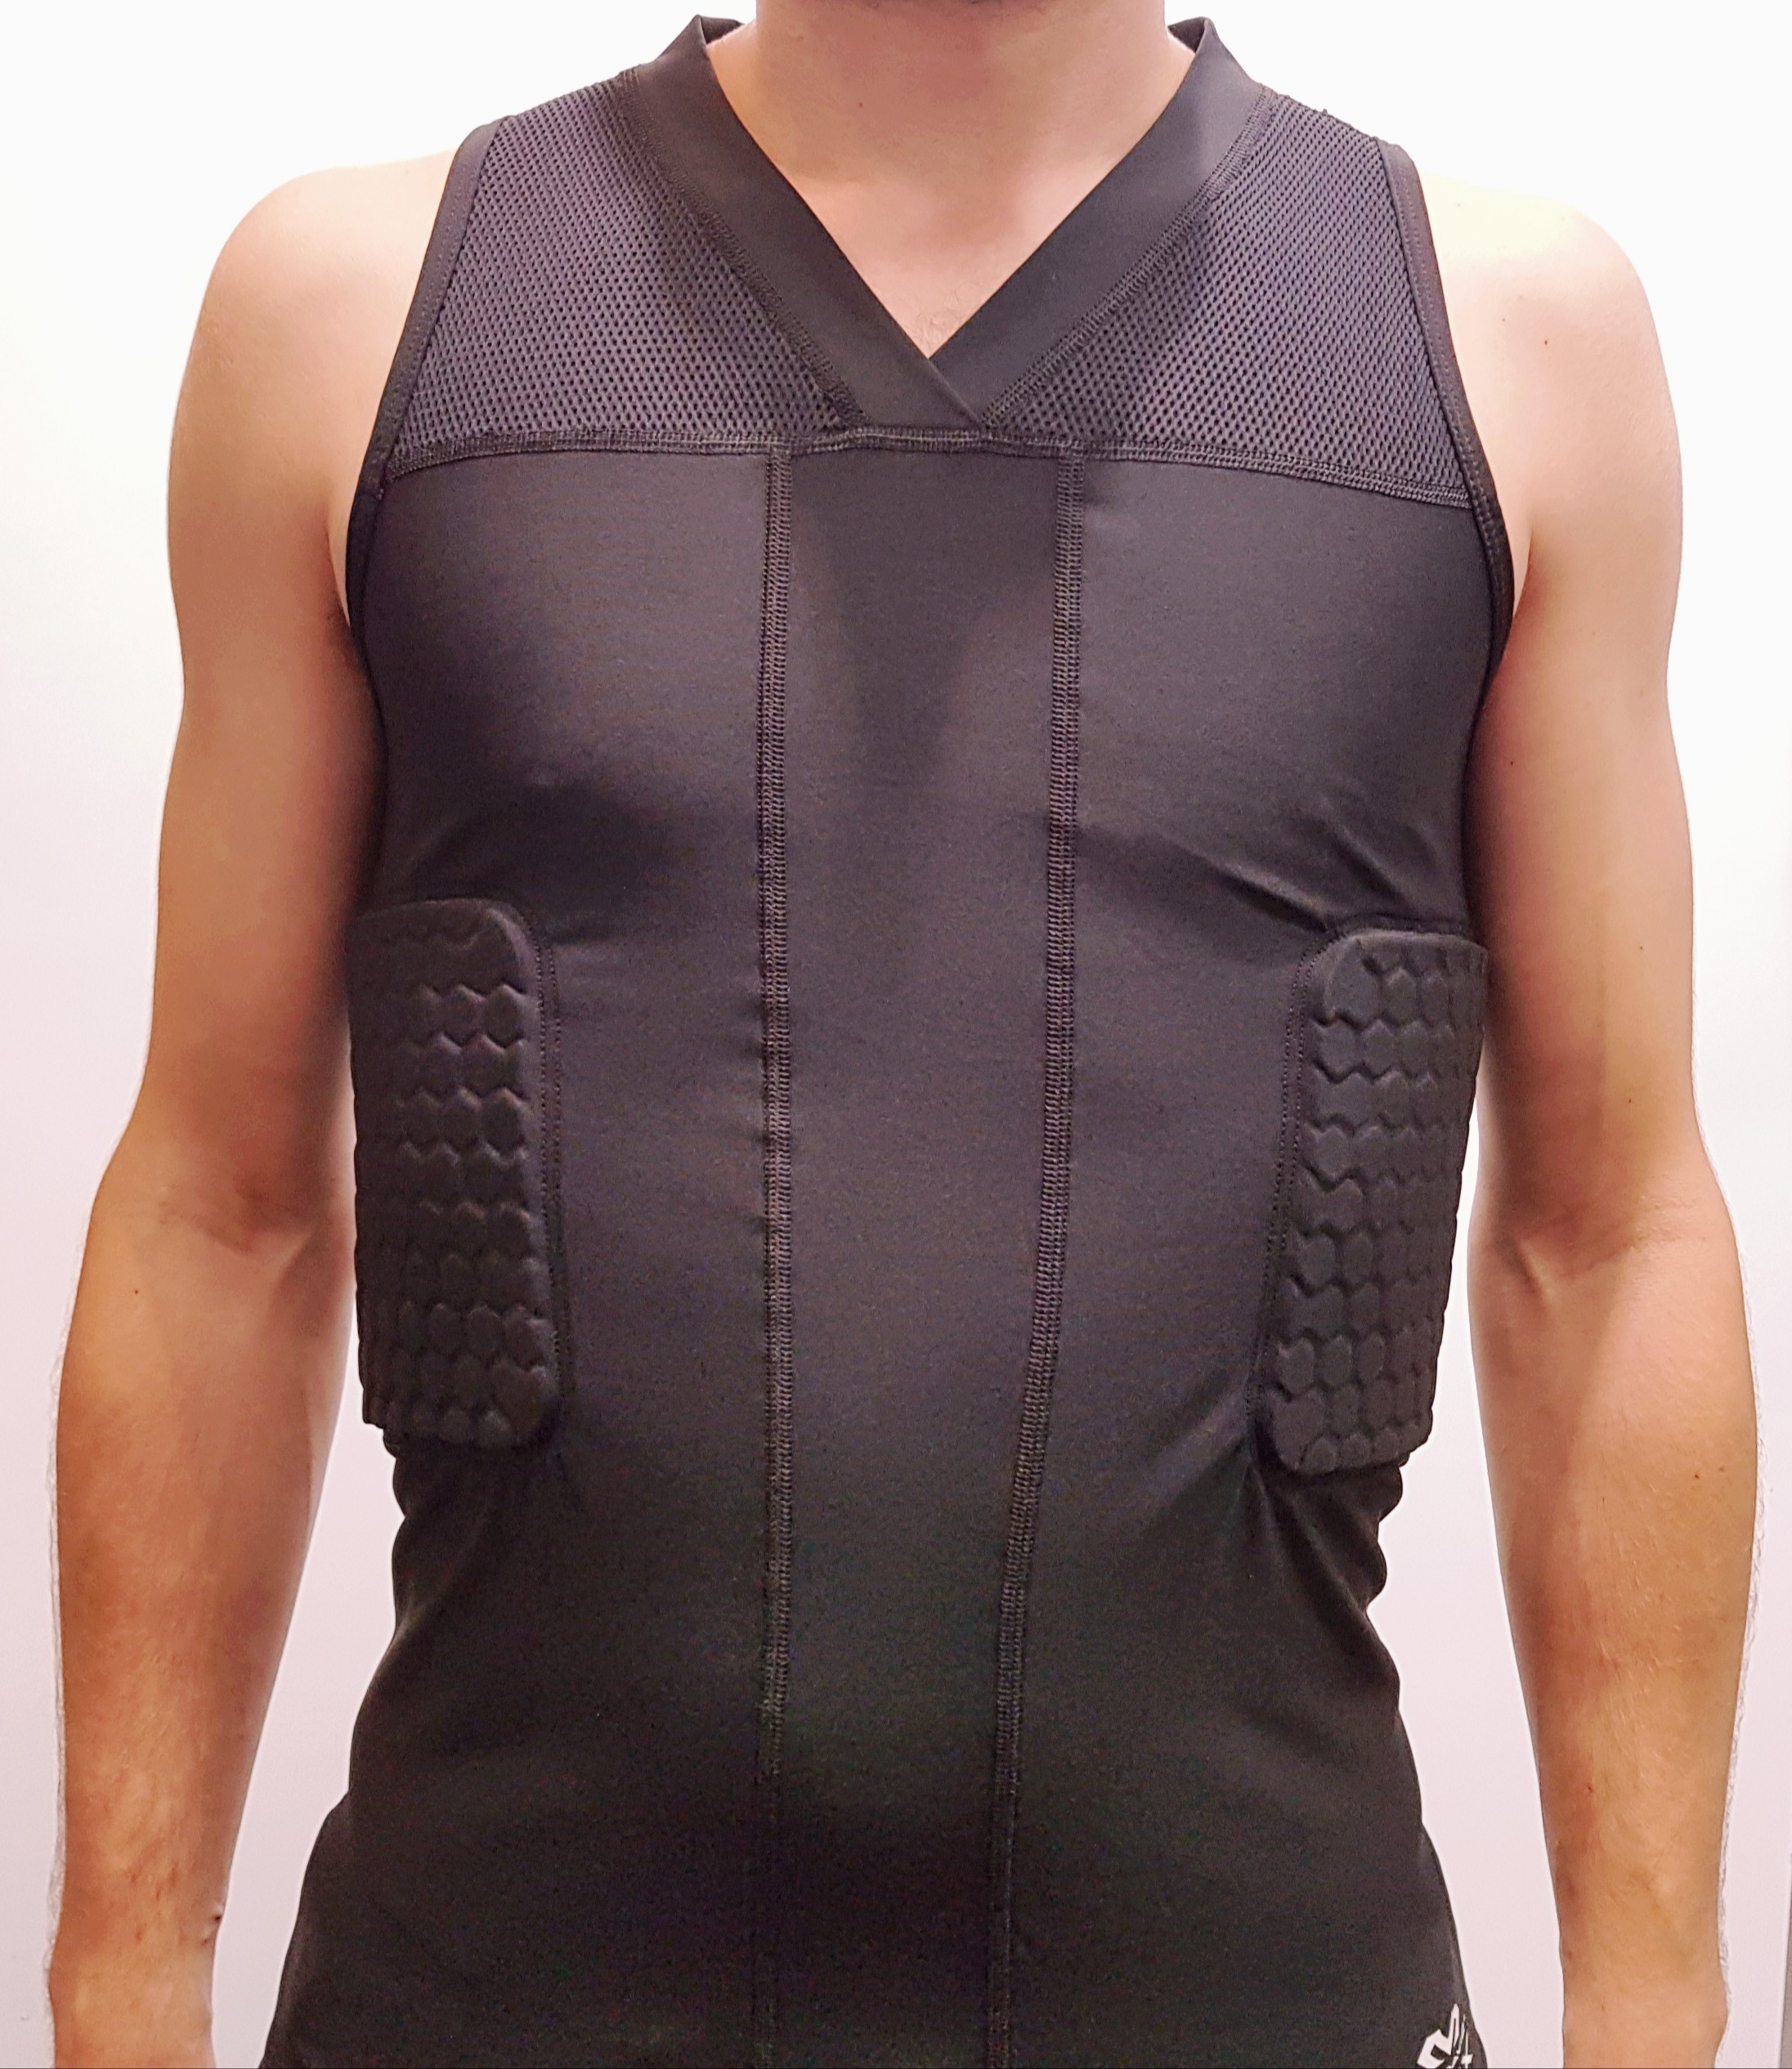 MCDAVID Hex Tank Underwear Shirt